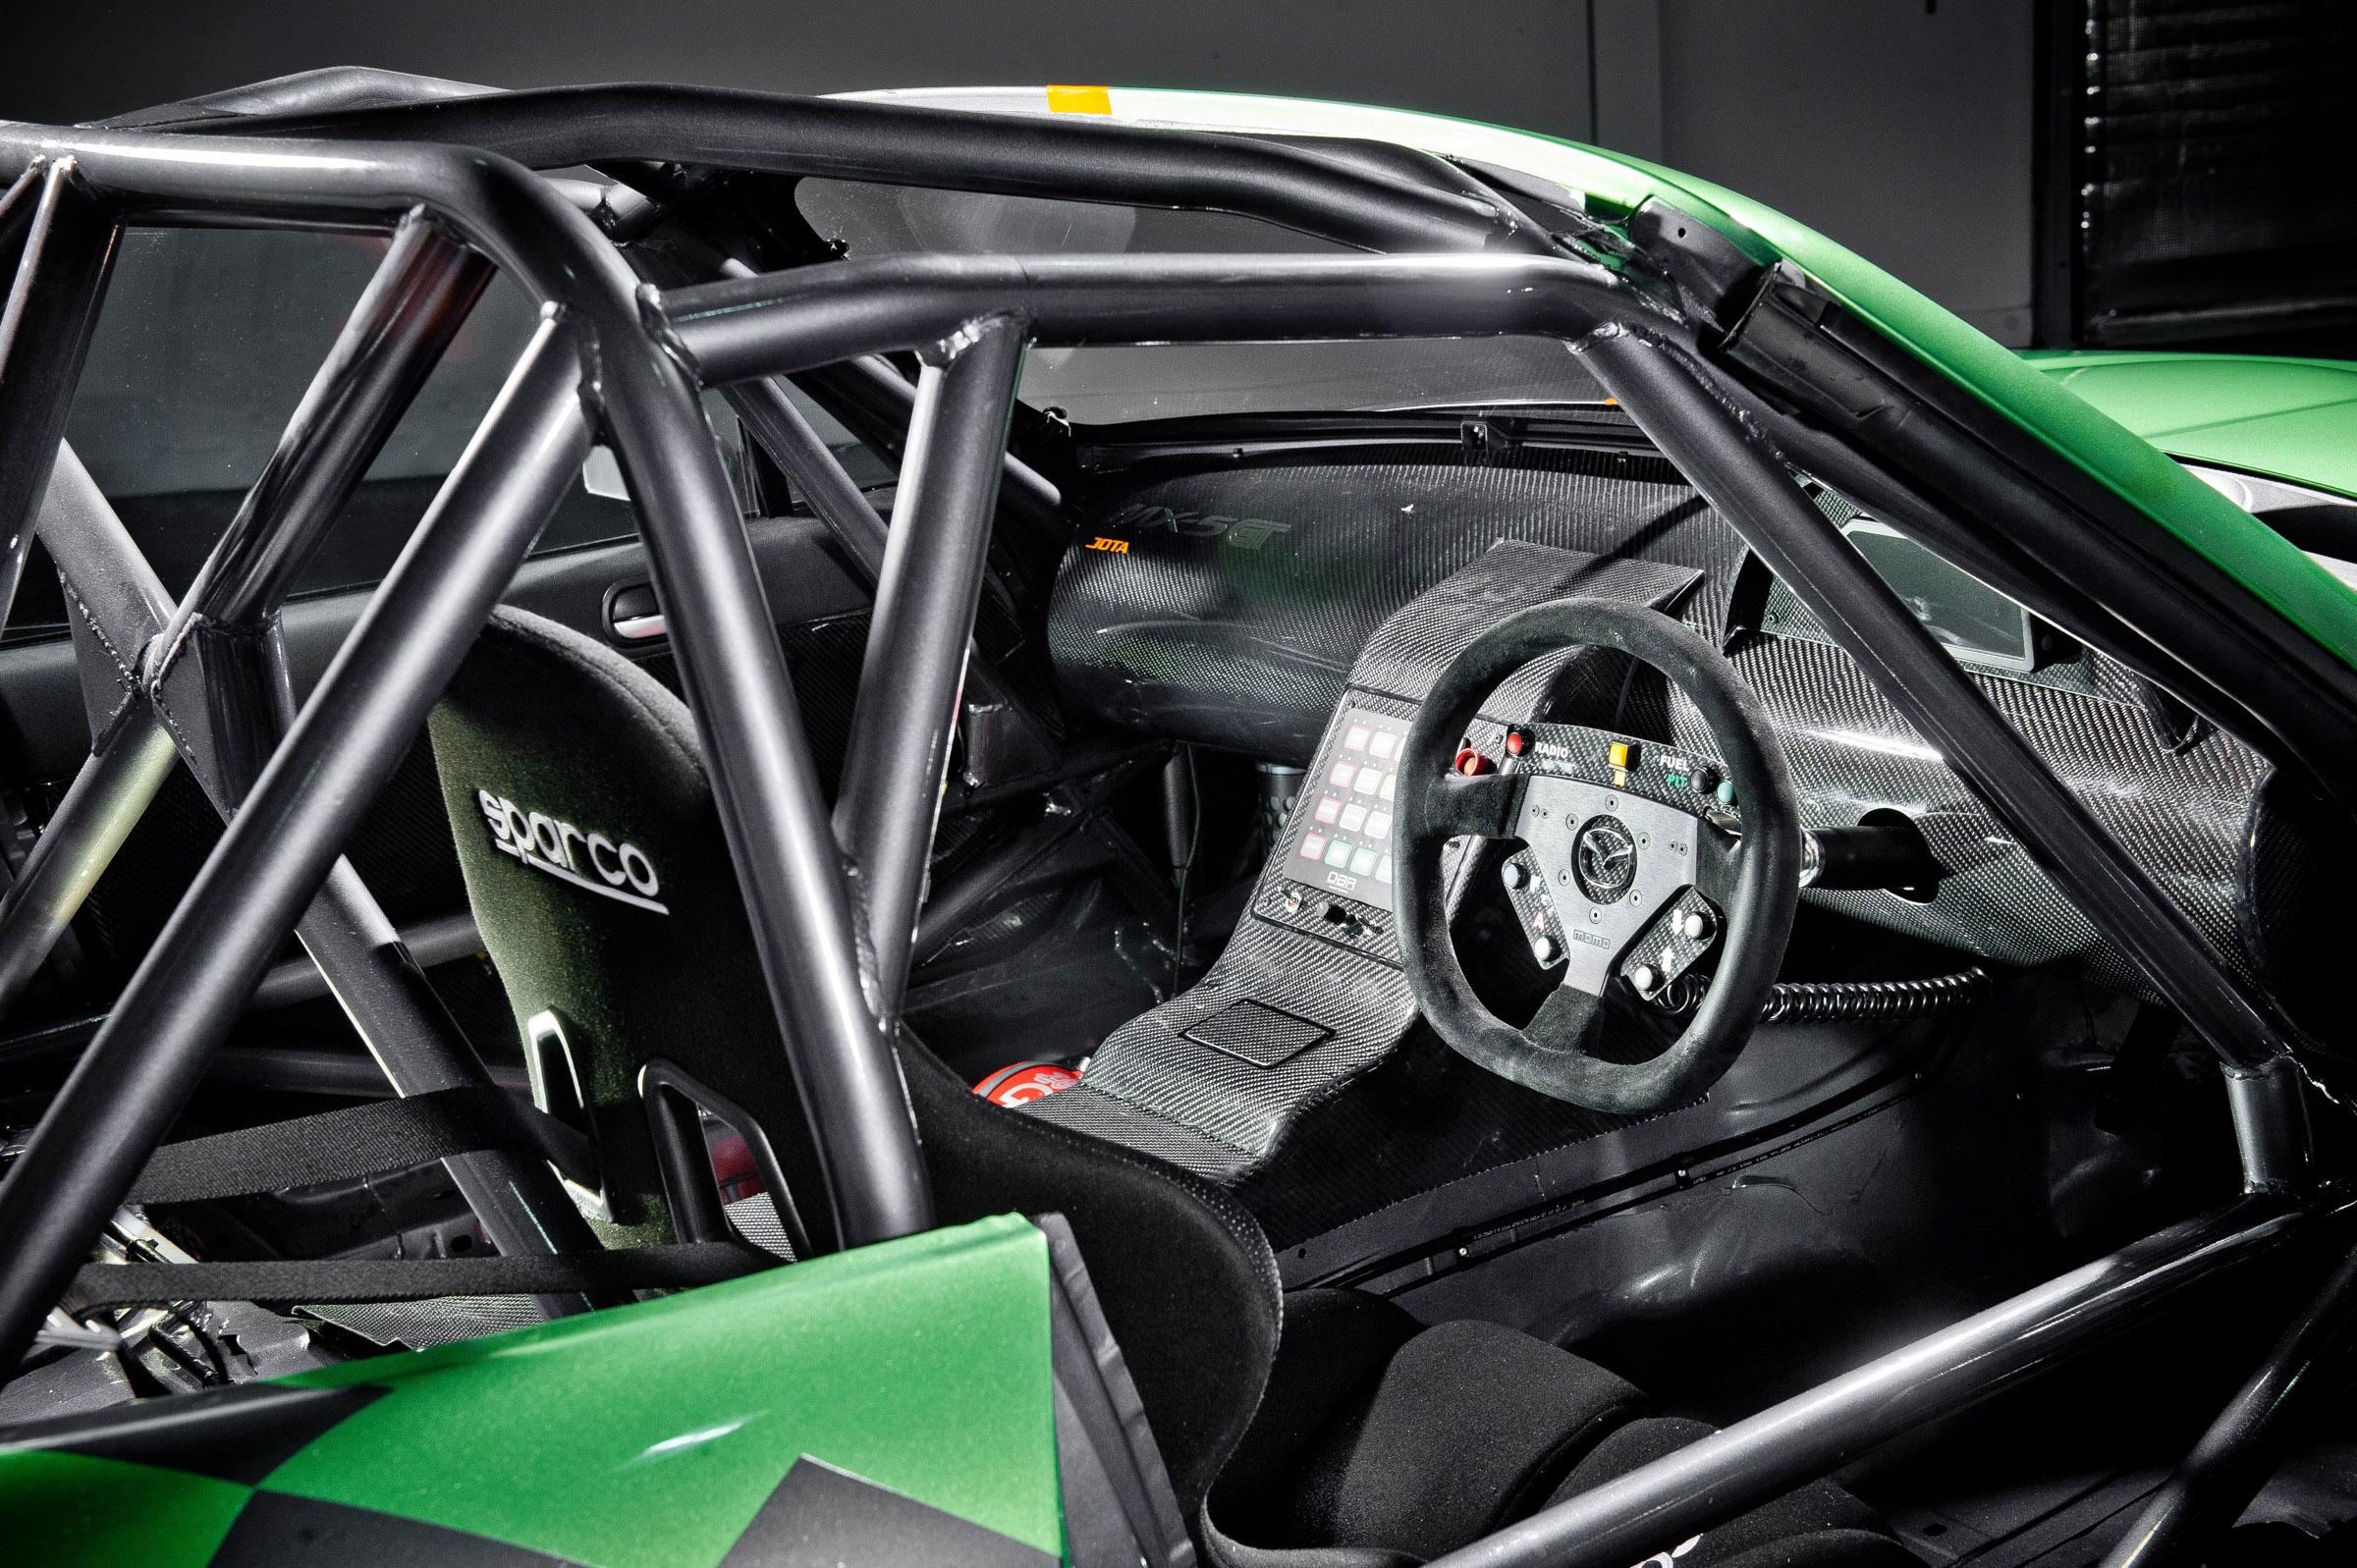 Index of /img/mazda-mx-5-gt-race-car